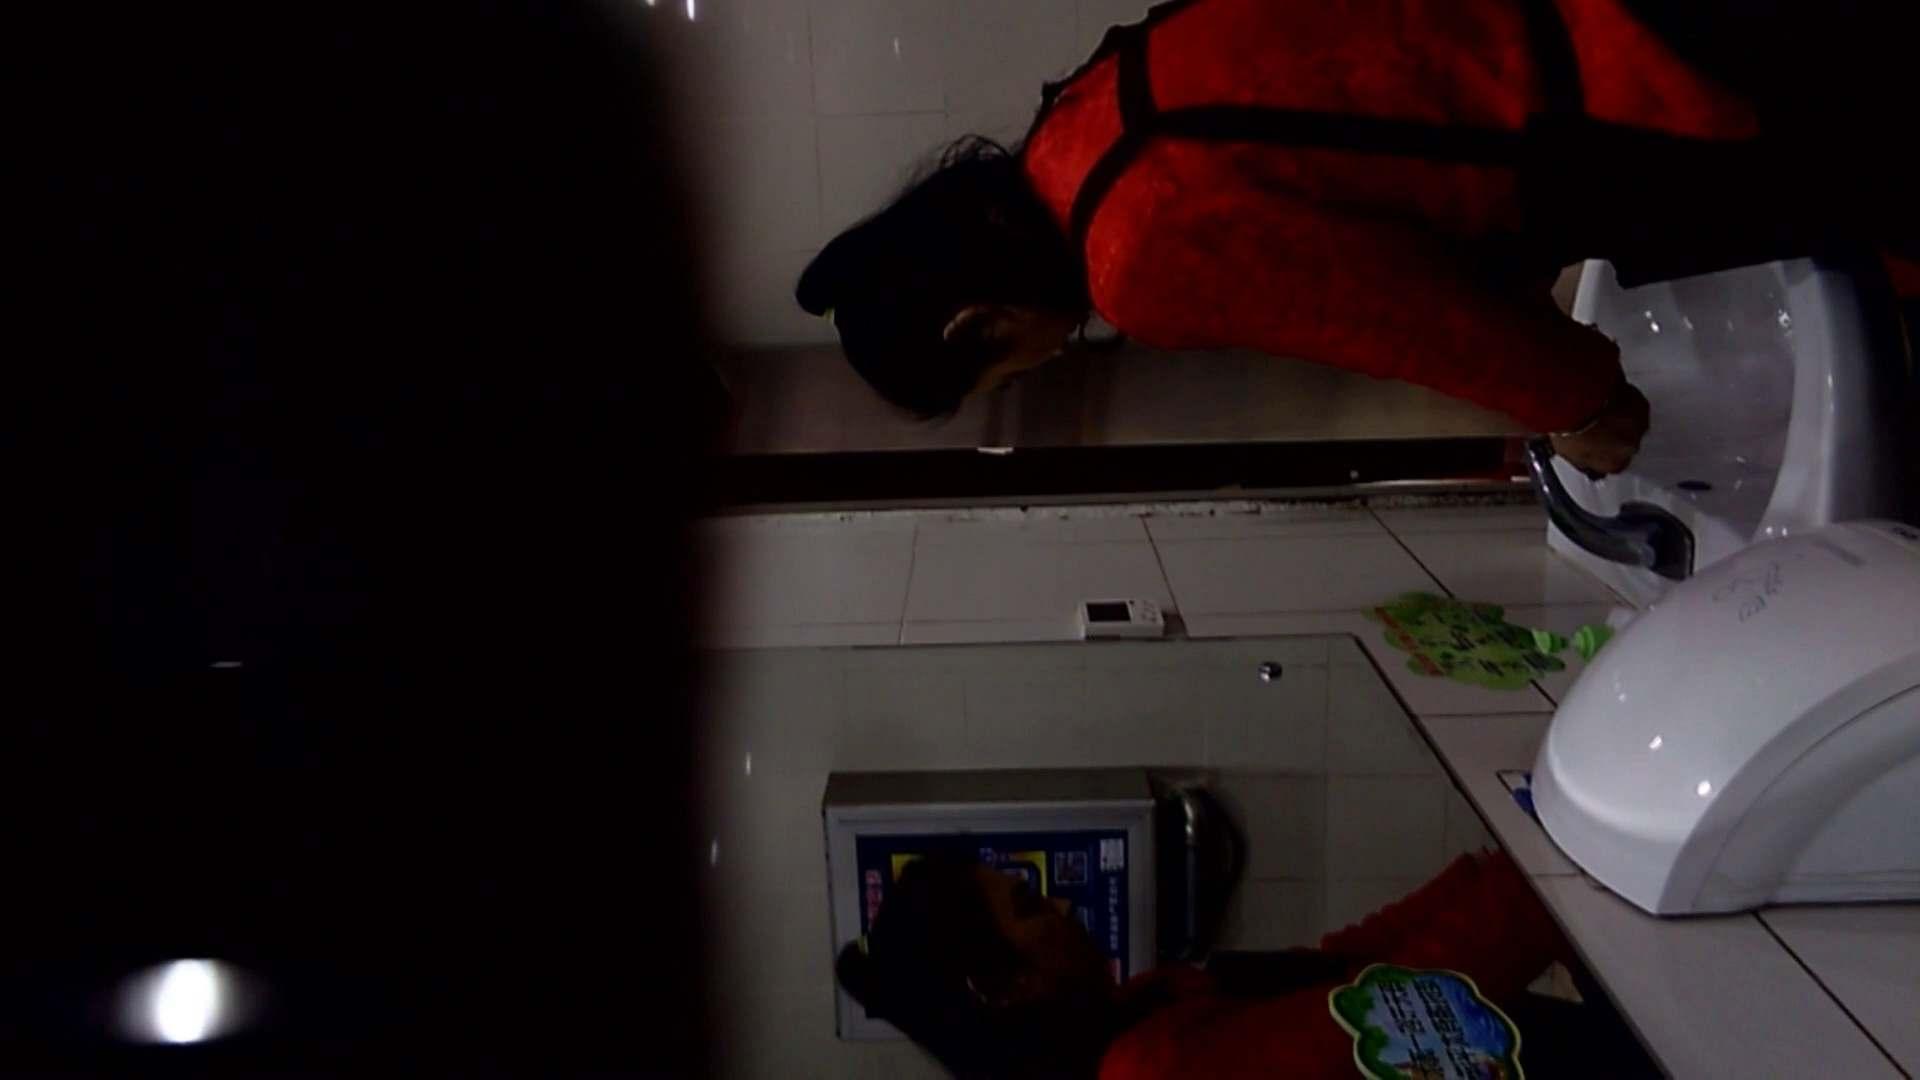 芸術大学ガチ潜入盗撮 JD盗撮 美女の洗面所の秘密 Vol.105 潜入 エロ画像 68画像 59